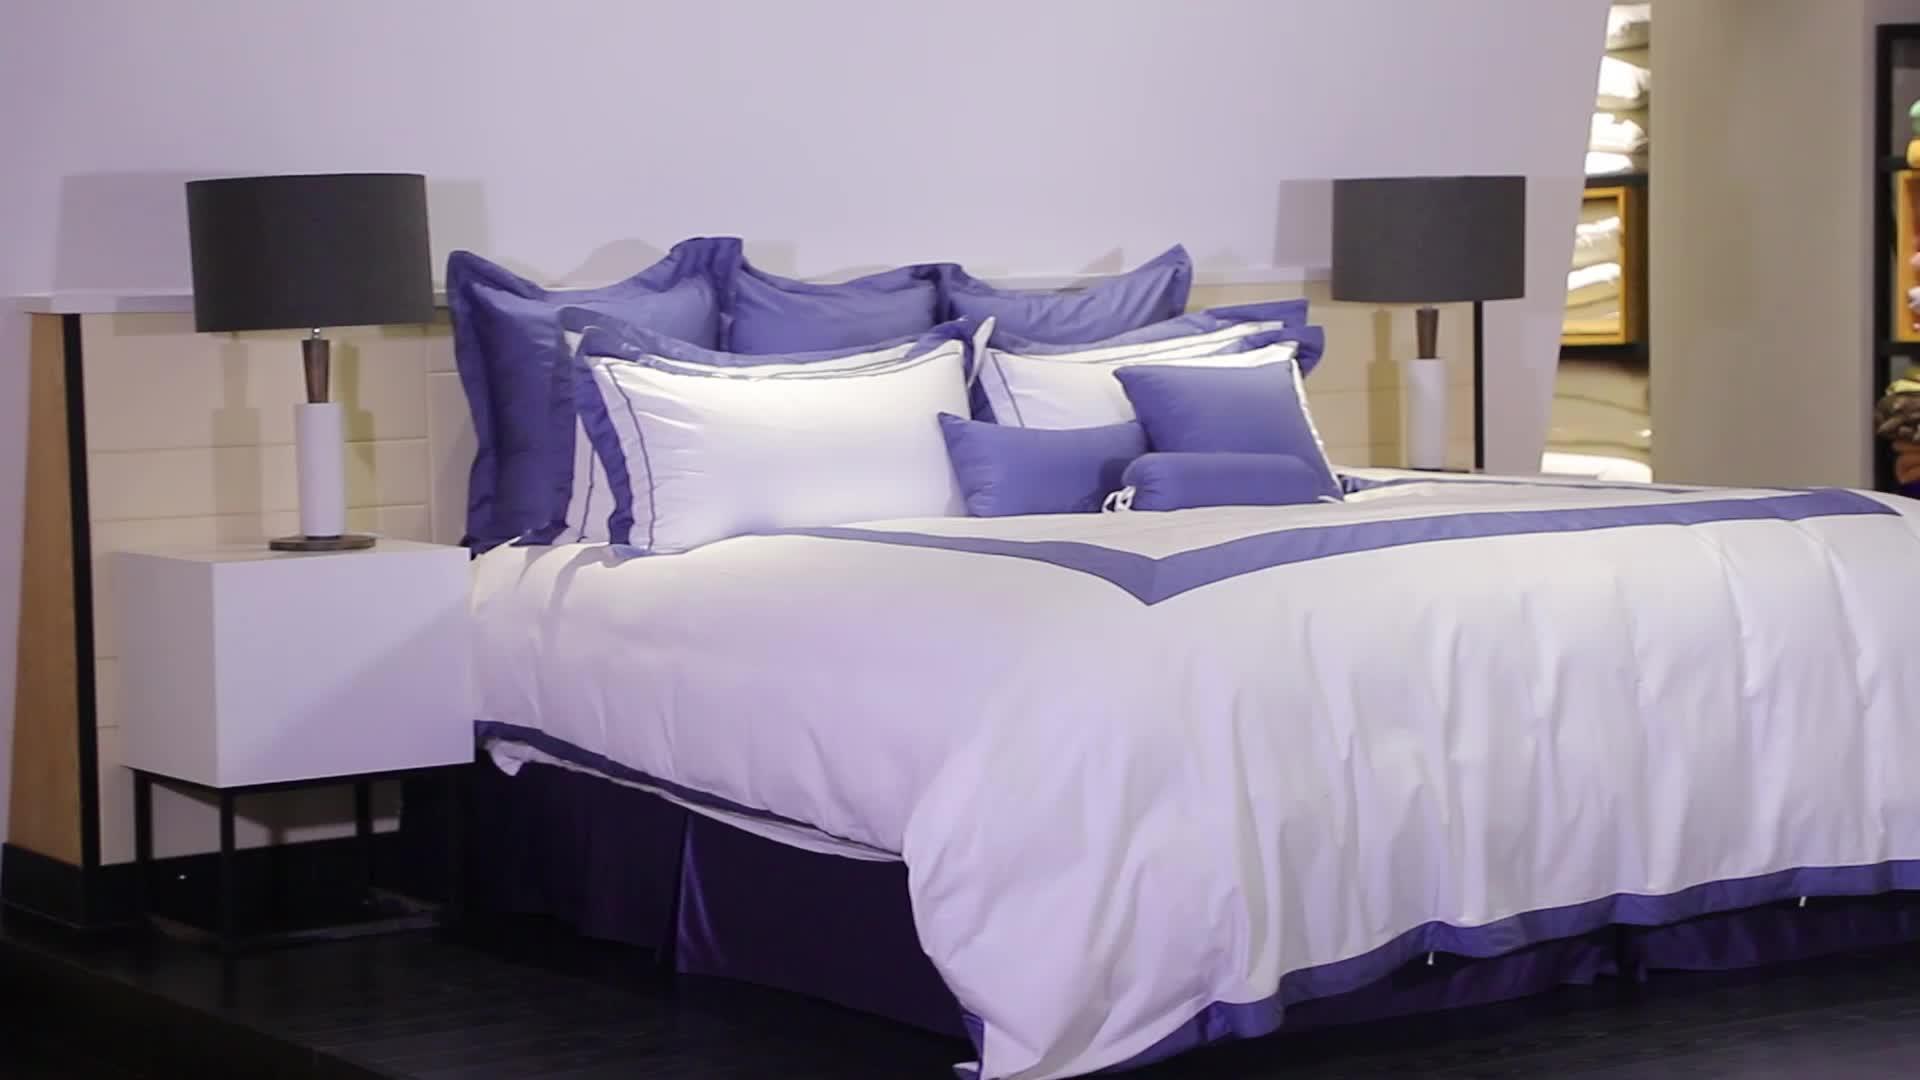 Customized Logo 1CM Satin 100% Polyester Duvet Cover Water Proof Hotel Hospital Bedsheet Set